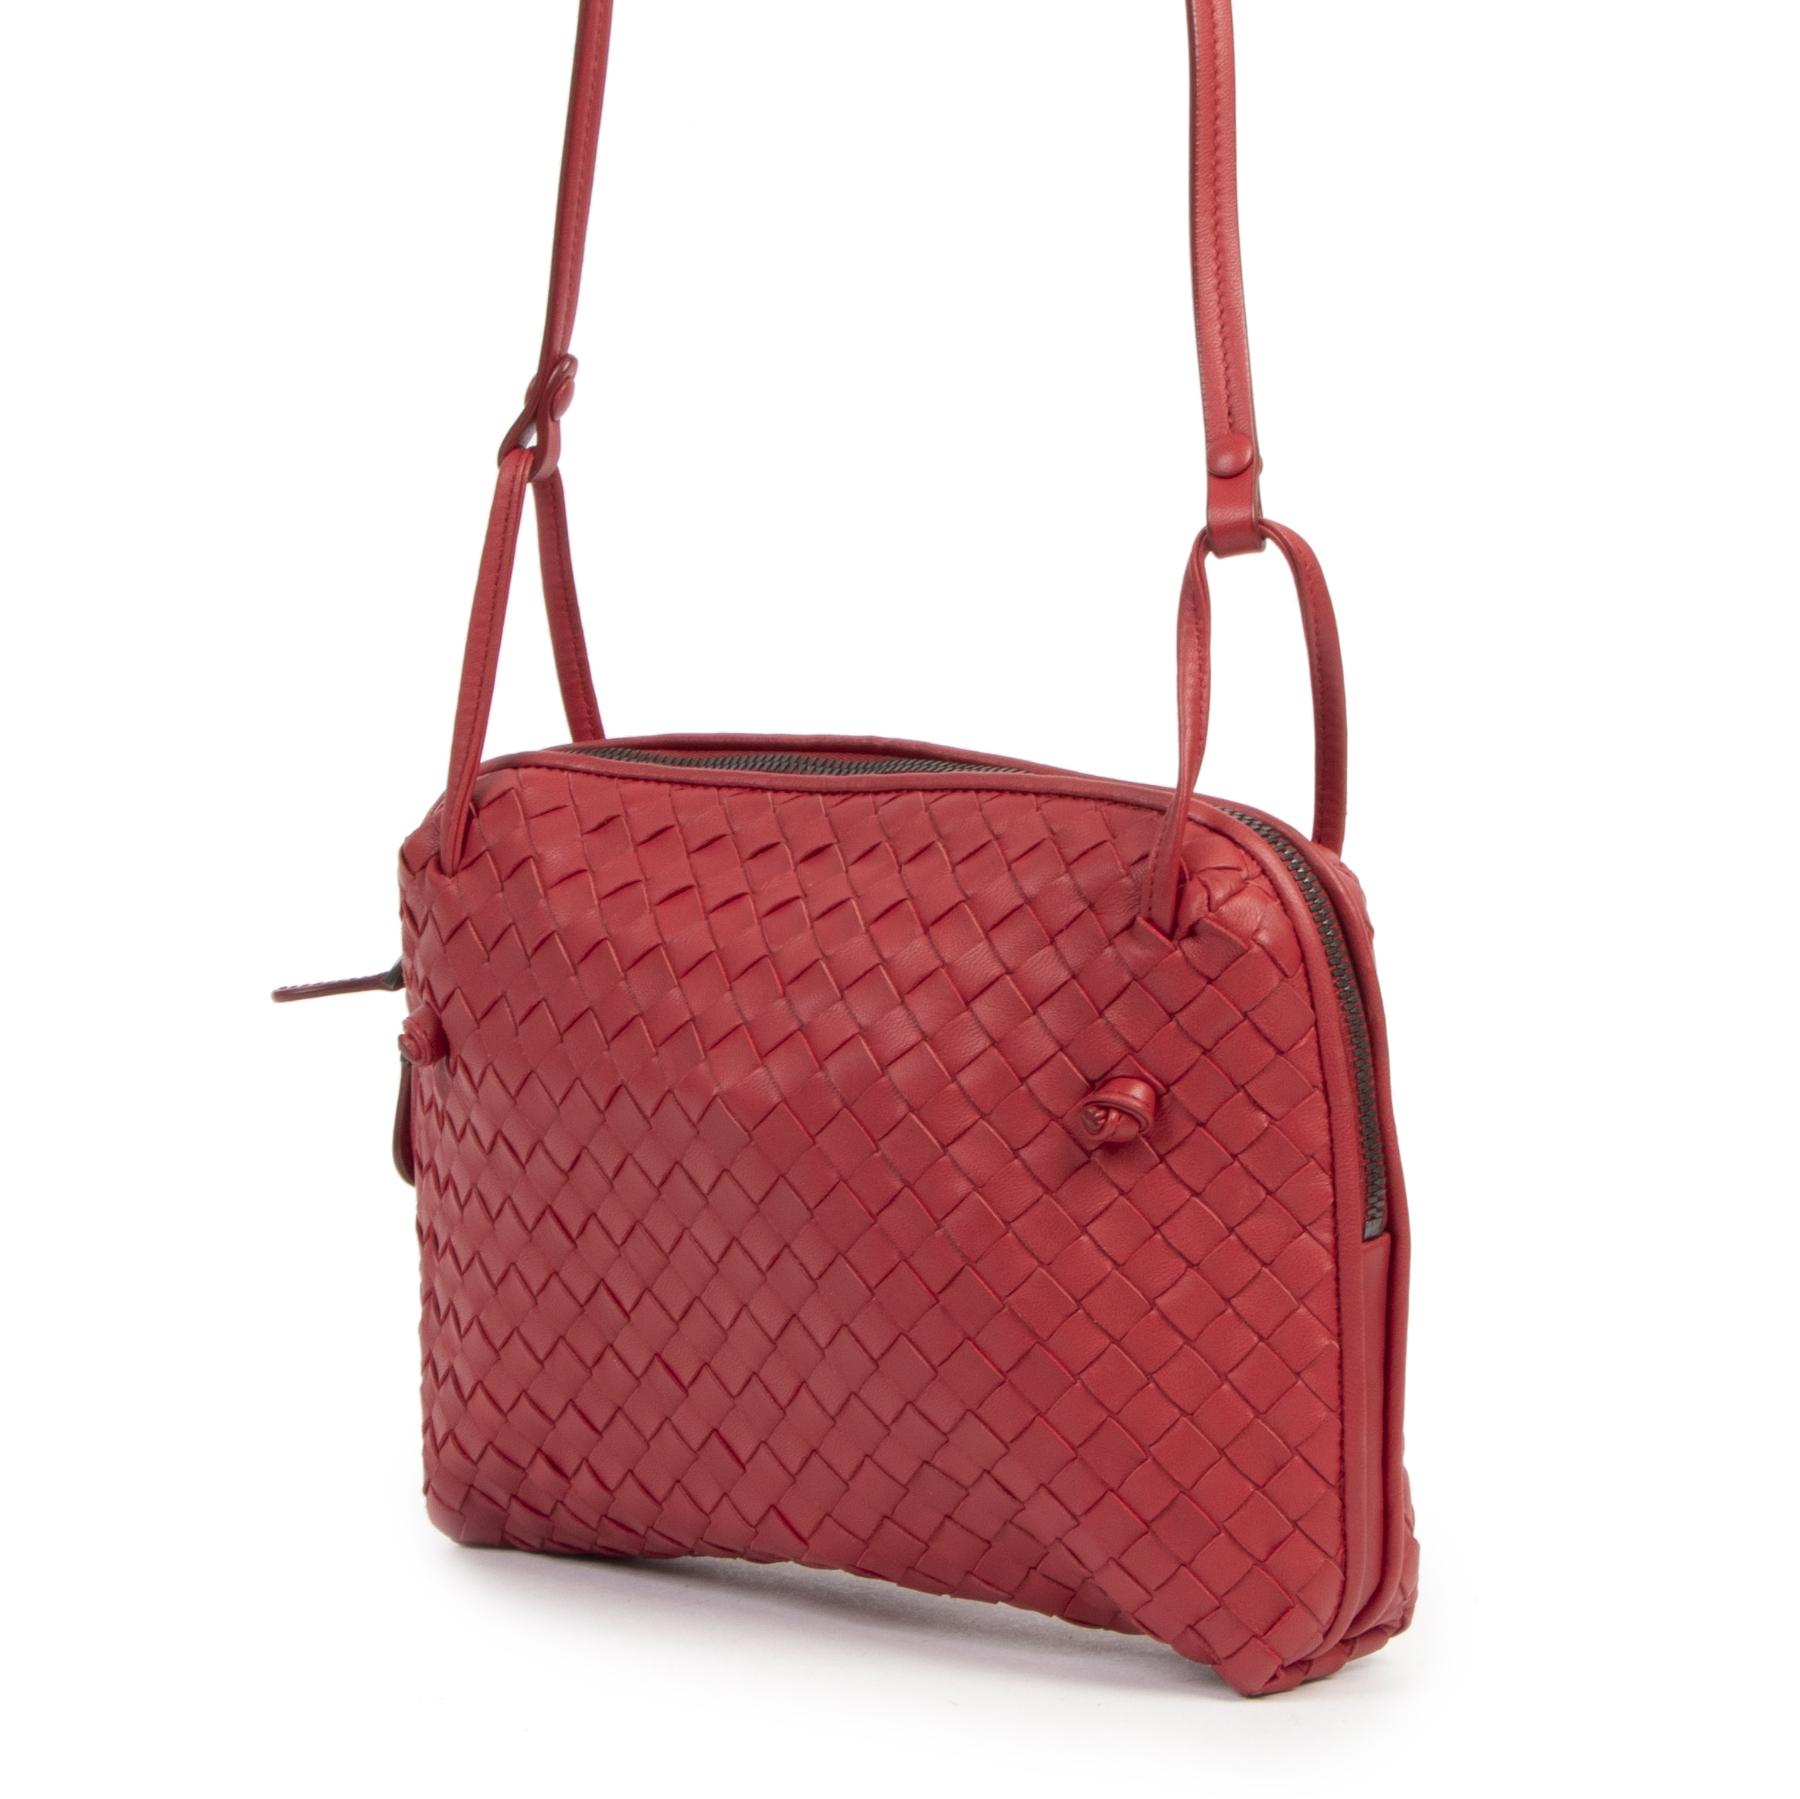 Authentique seconde-main vintage Bottega Veneta Dahlia Intrecciato Nappa Messenger Bag  achète en ligne webshop LabelLOV